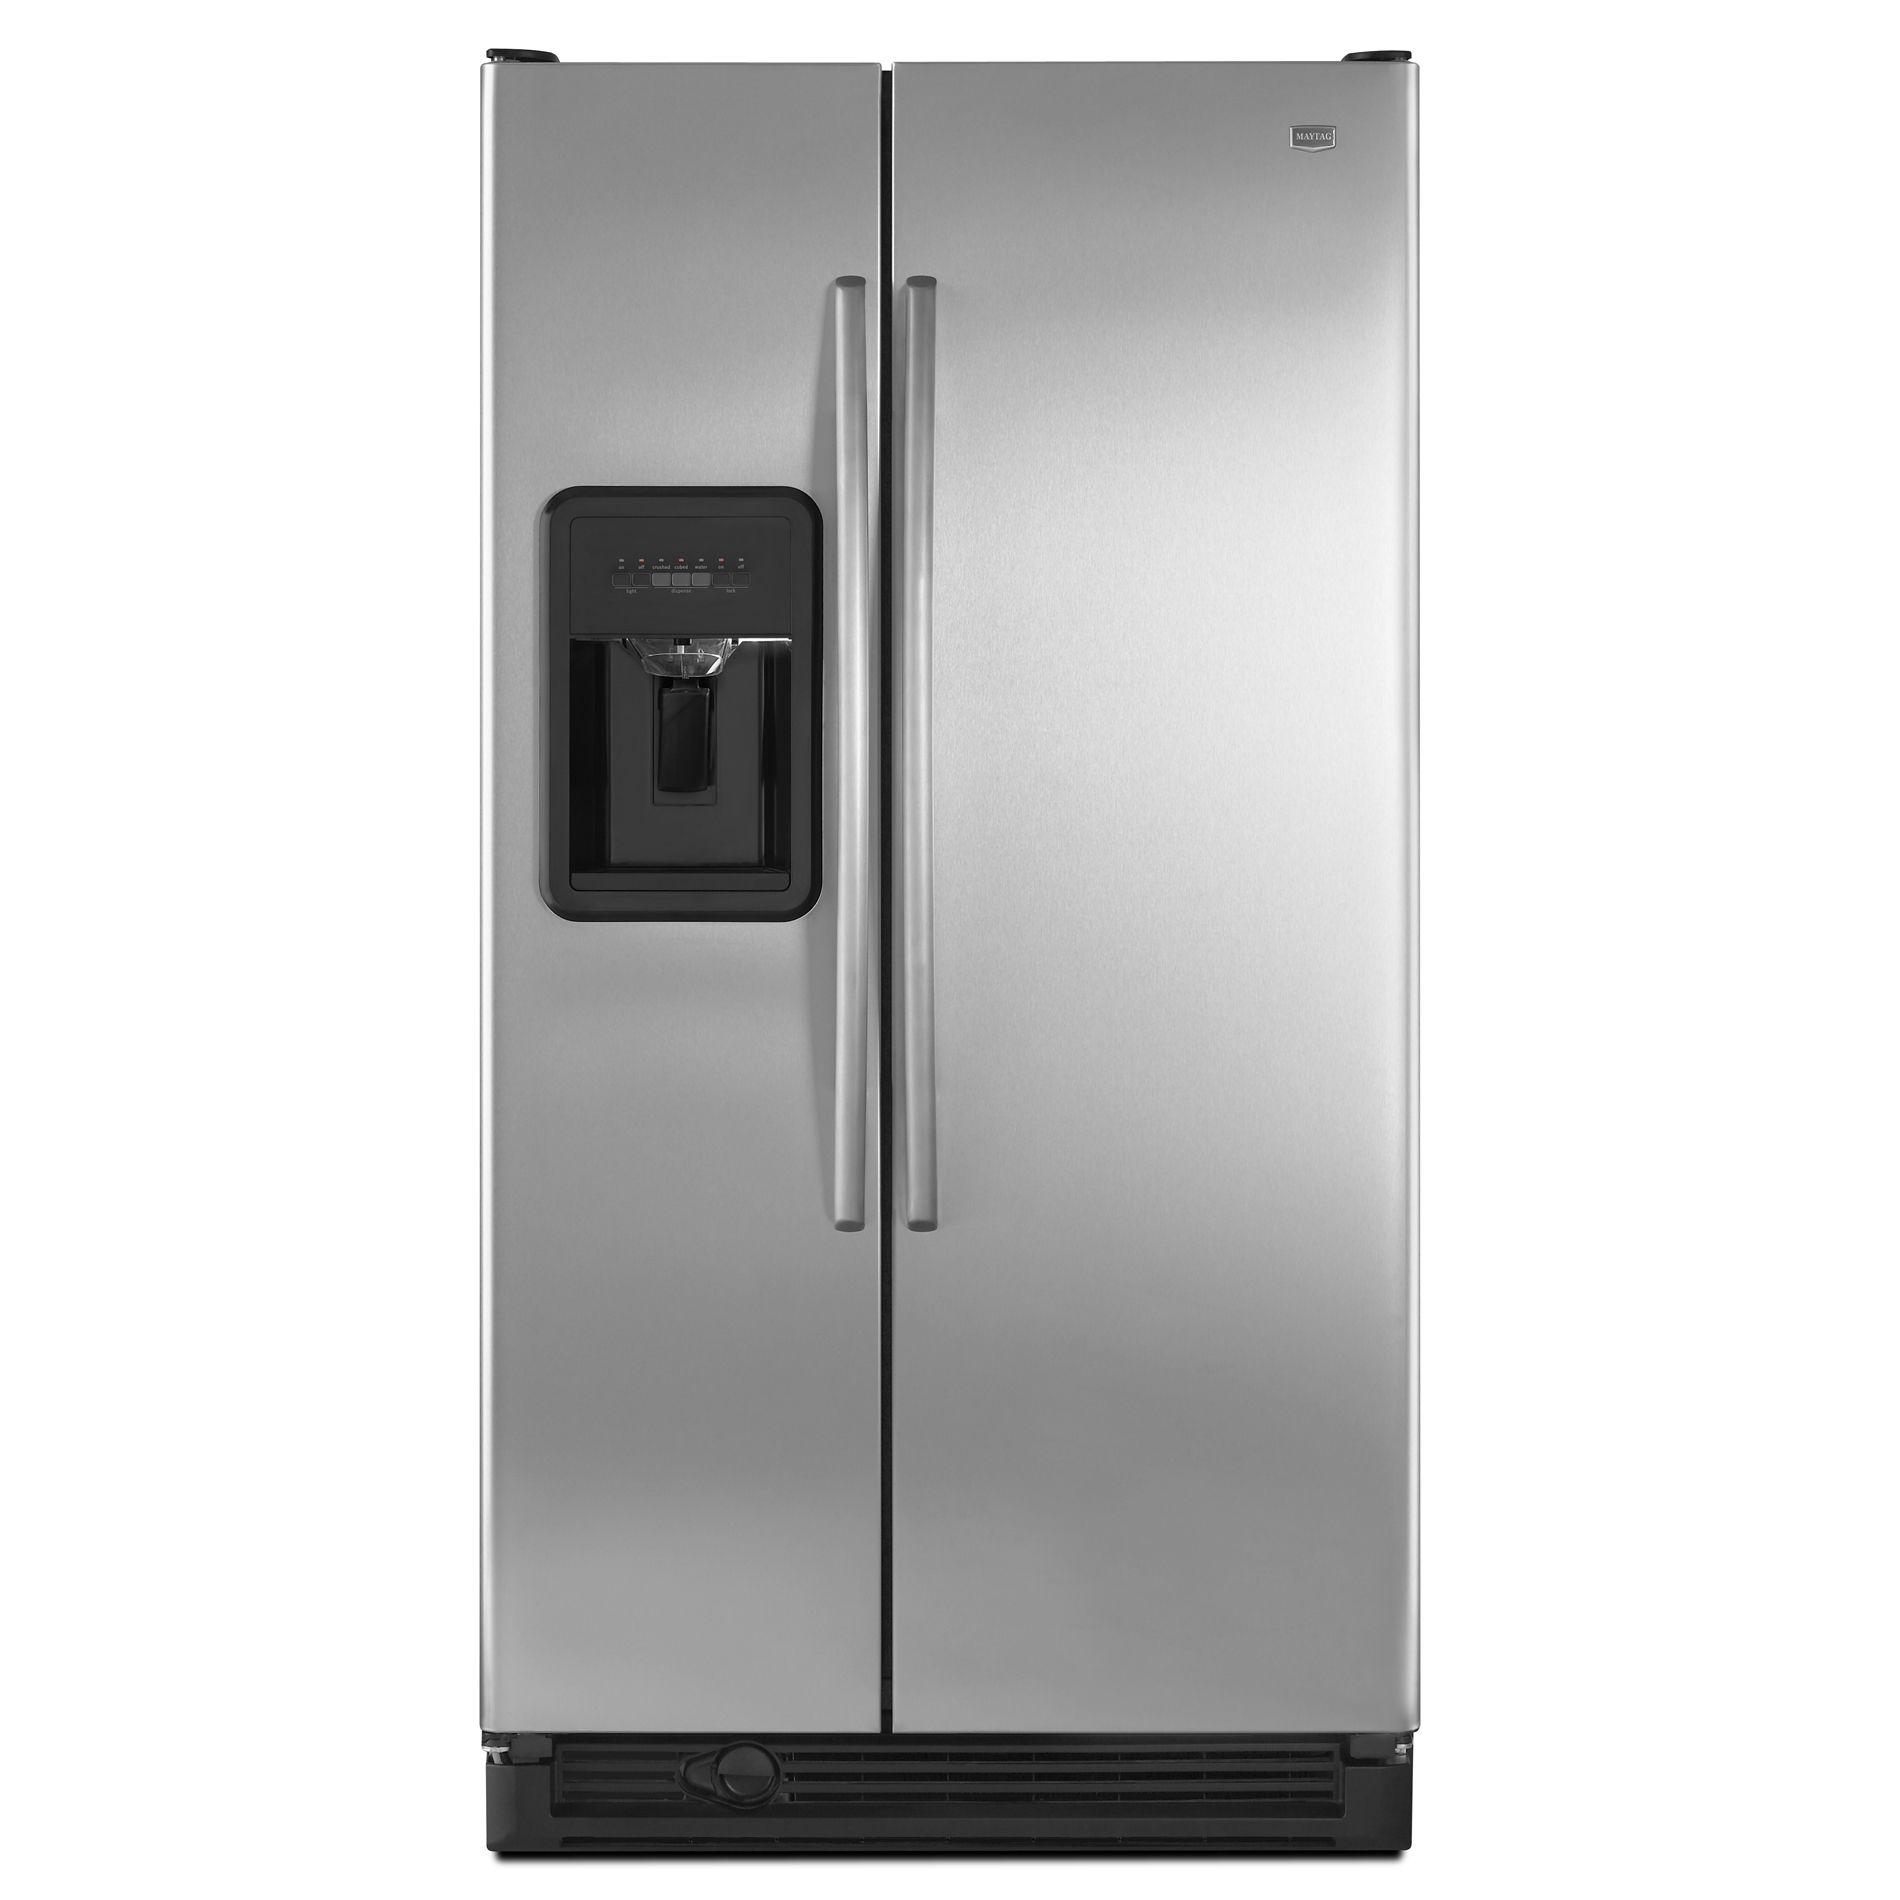 Maytag fridge water hookup